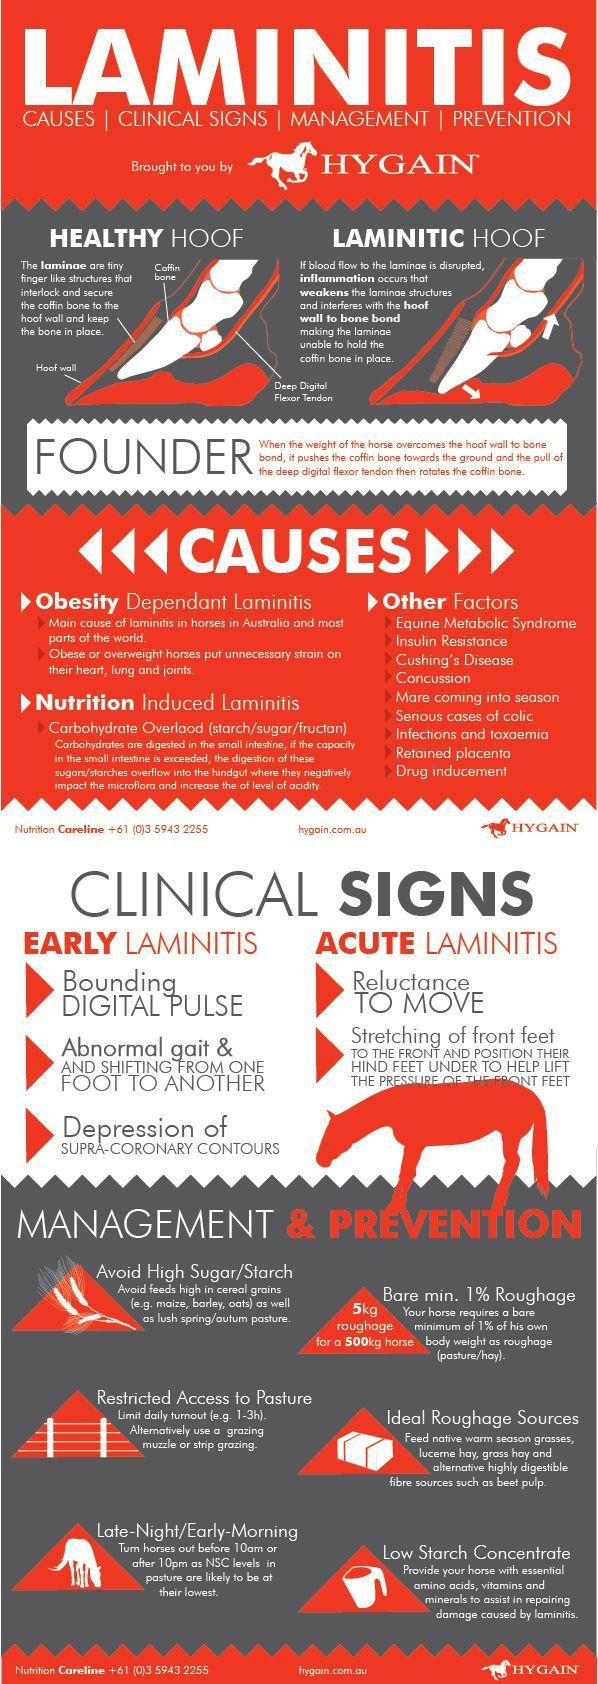 Fact Sheet - Laminitis in Horses | Horse health. Healthy horses. Horse care tips